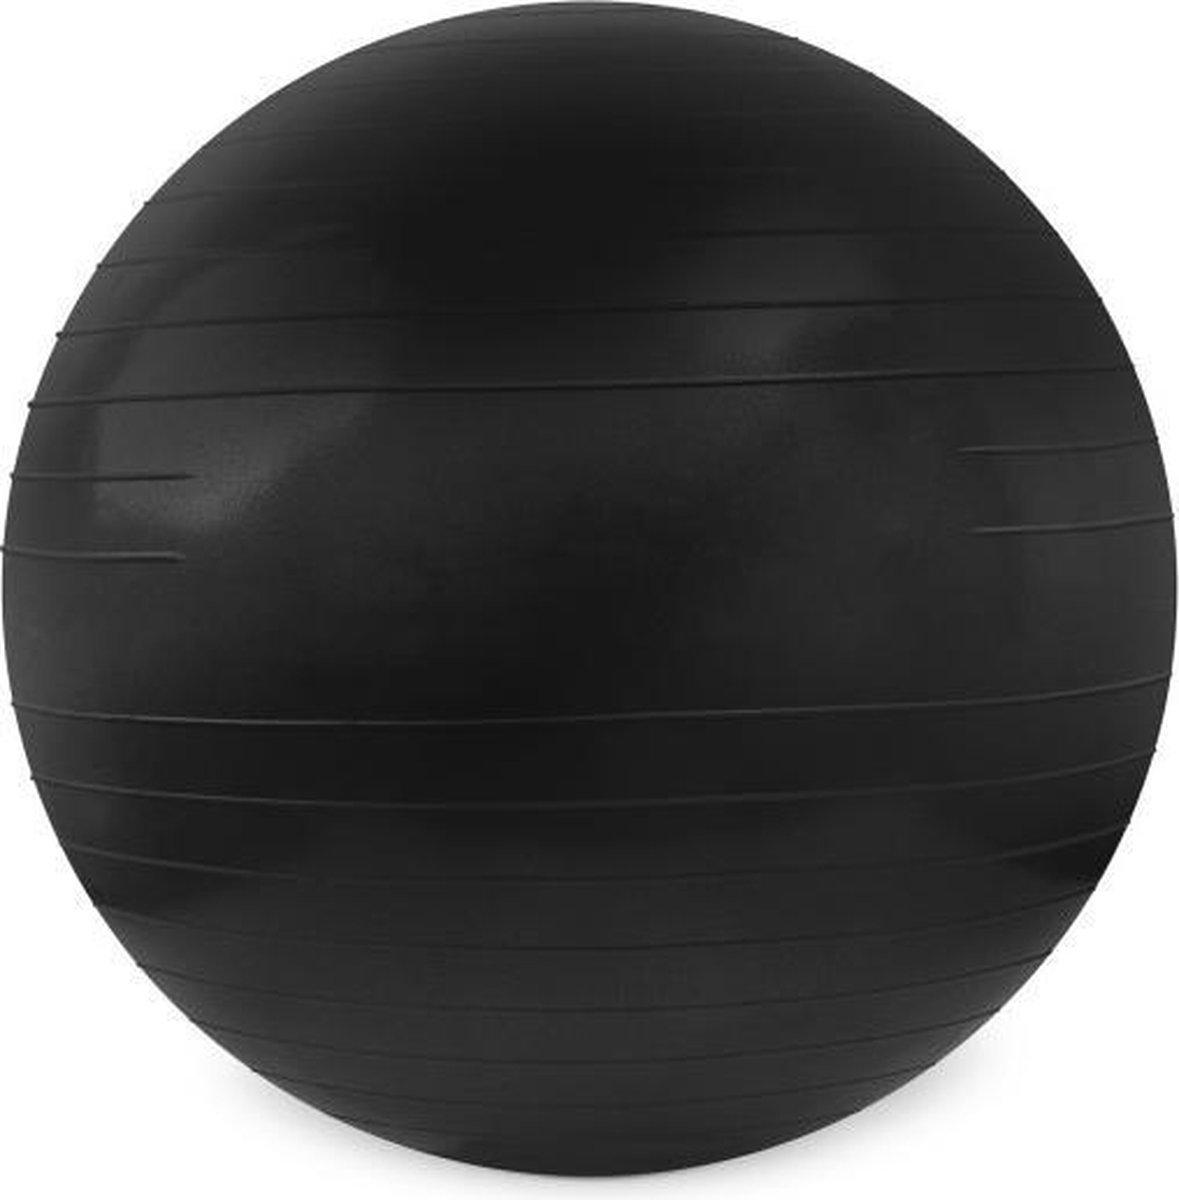 Matchu Sports Fitnessbal 85cm Zwart (Matchu Sports Gymbal 80cm Black). - Matchu Sports